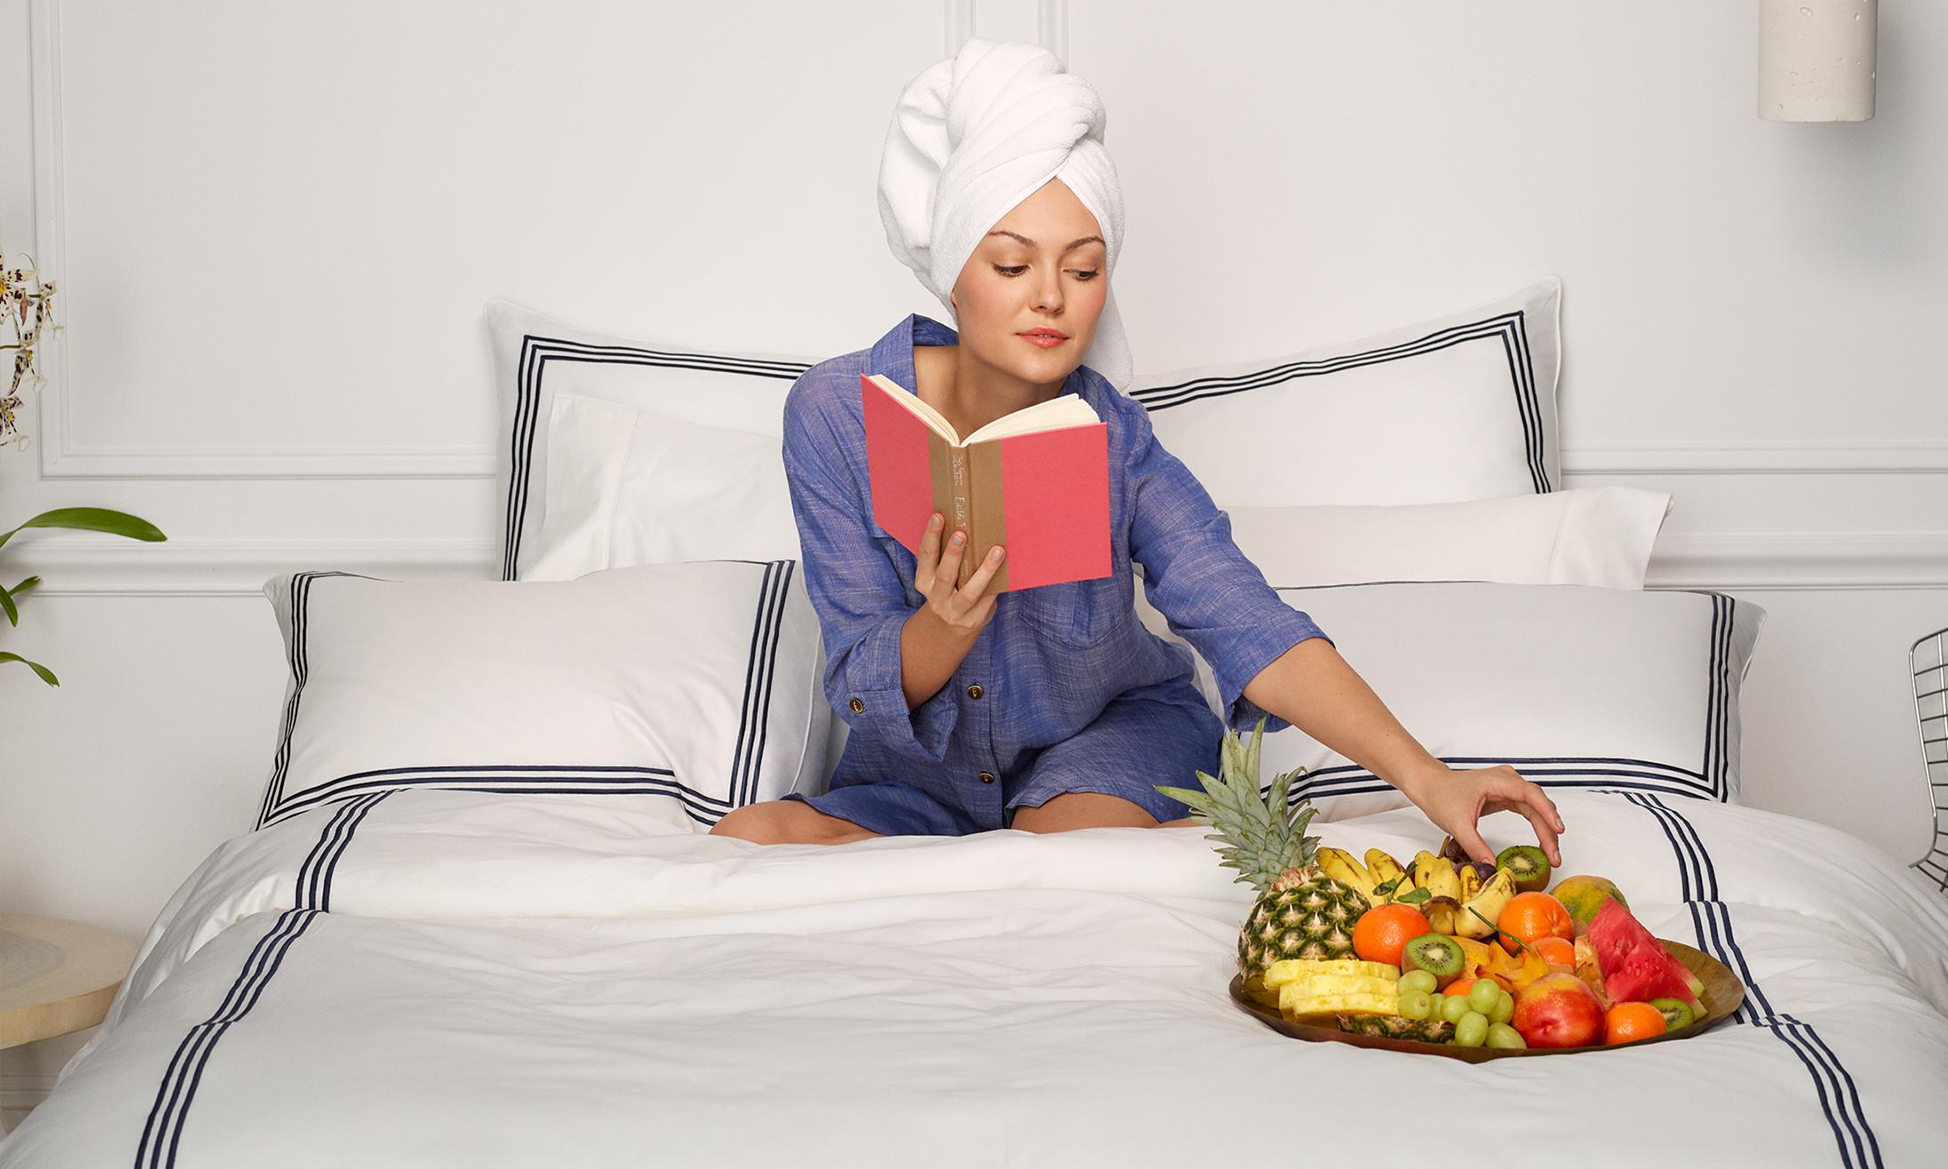 Woman Sitting on Premium Sheets